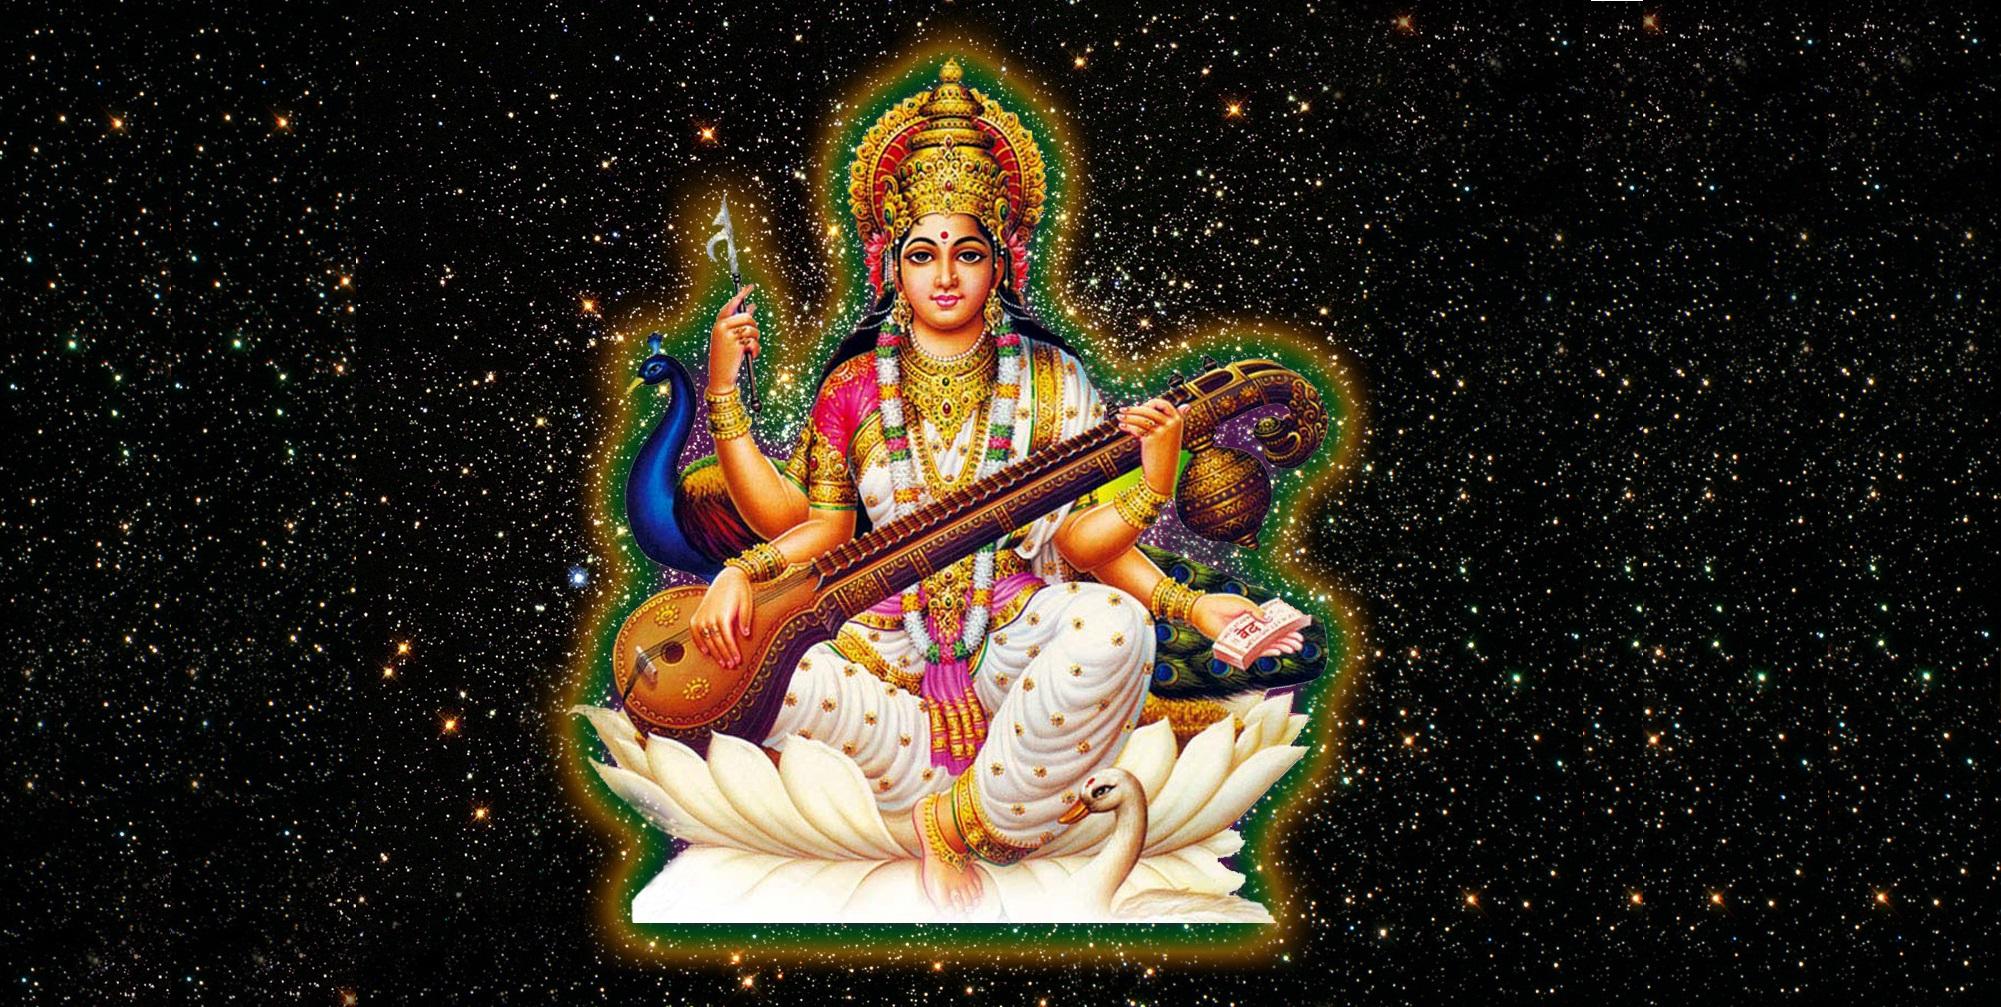 Happy Holi Full Hd Wallpaper 108 Names Of Saraswati Maa सरस्वती मा के १०८ नाम Wordzz